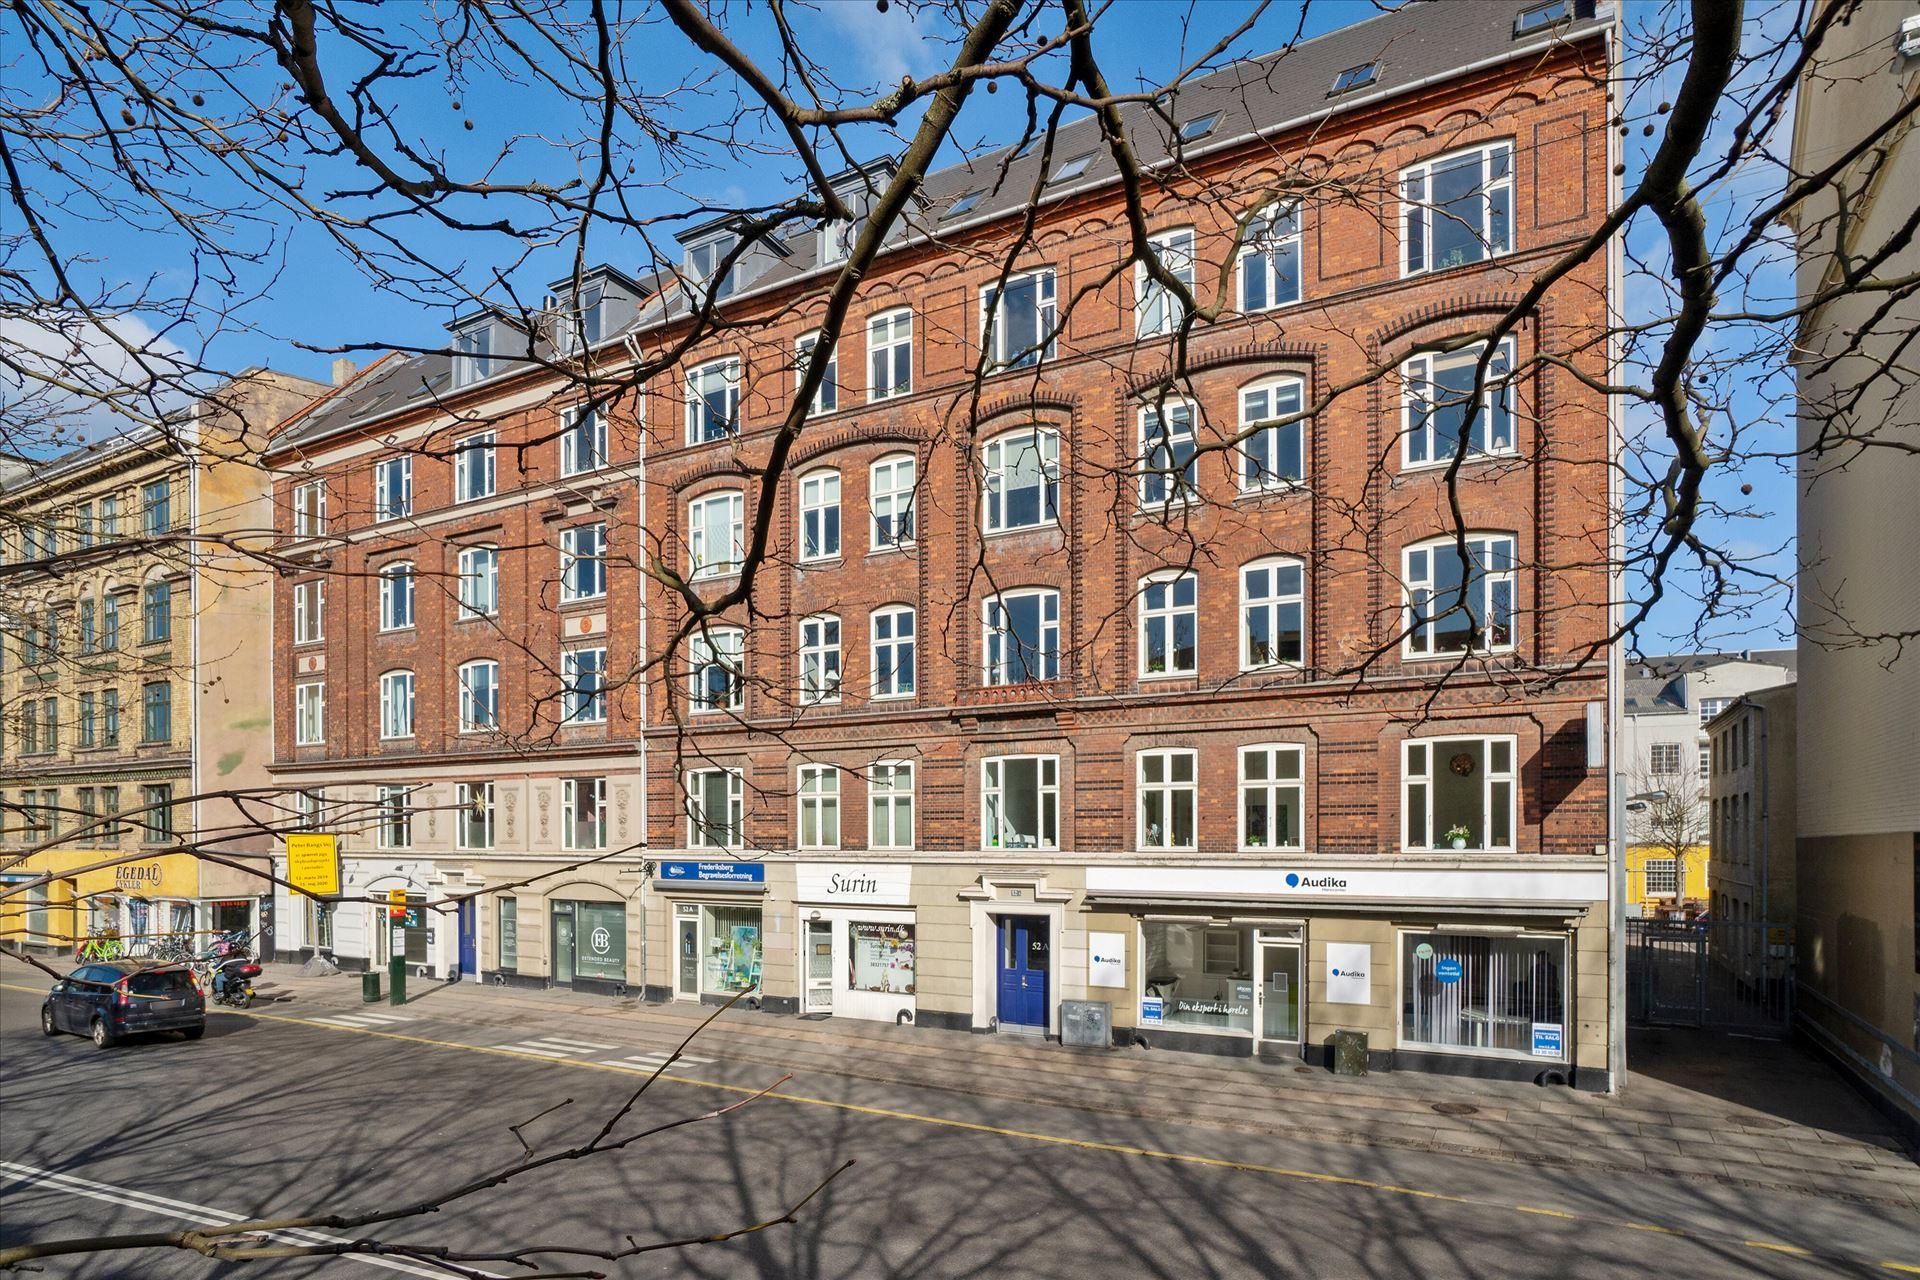 142 m² butiksandel til salg – Smallegade